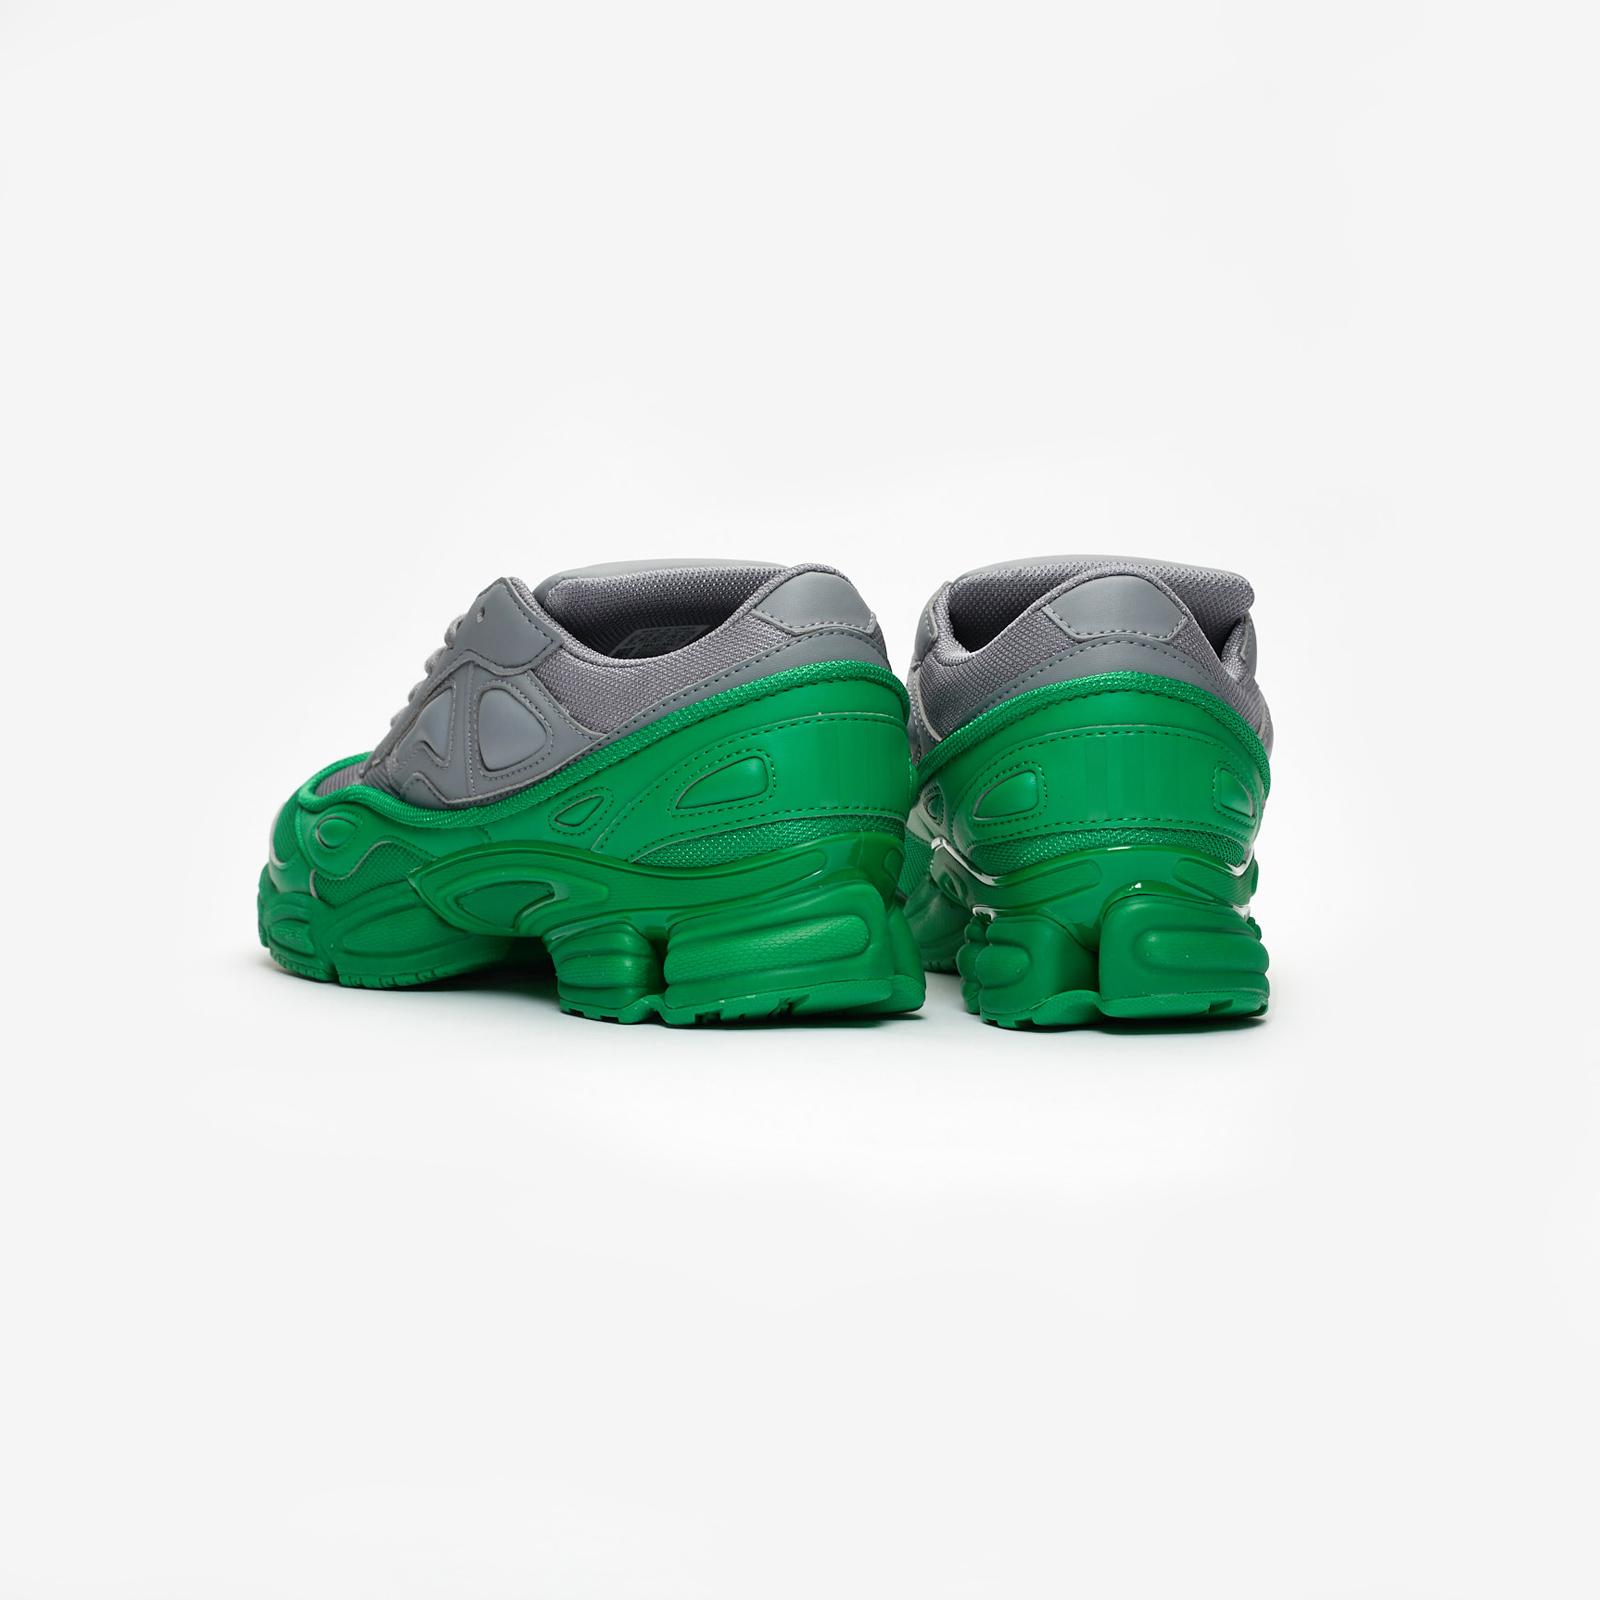 I Raf Adidas F34266 Sneakers Simons Sneakersnstuff Ozweego bfy76g